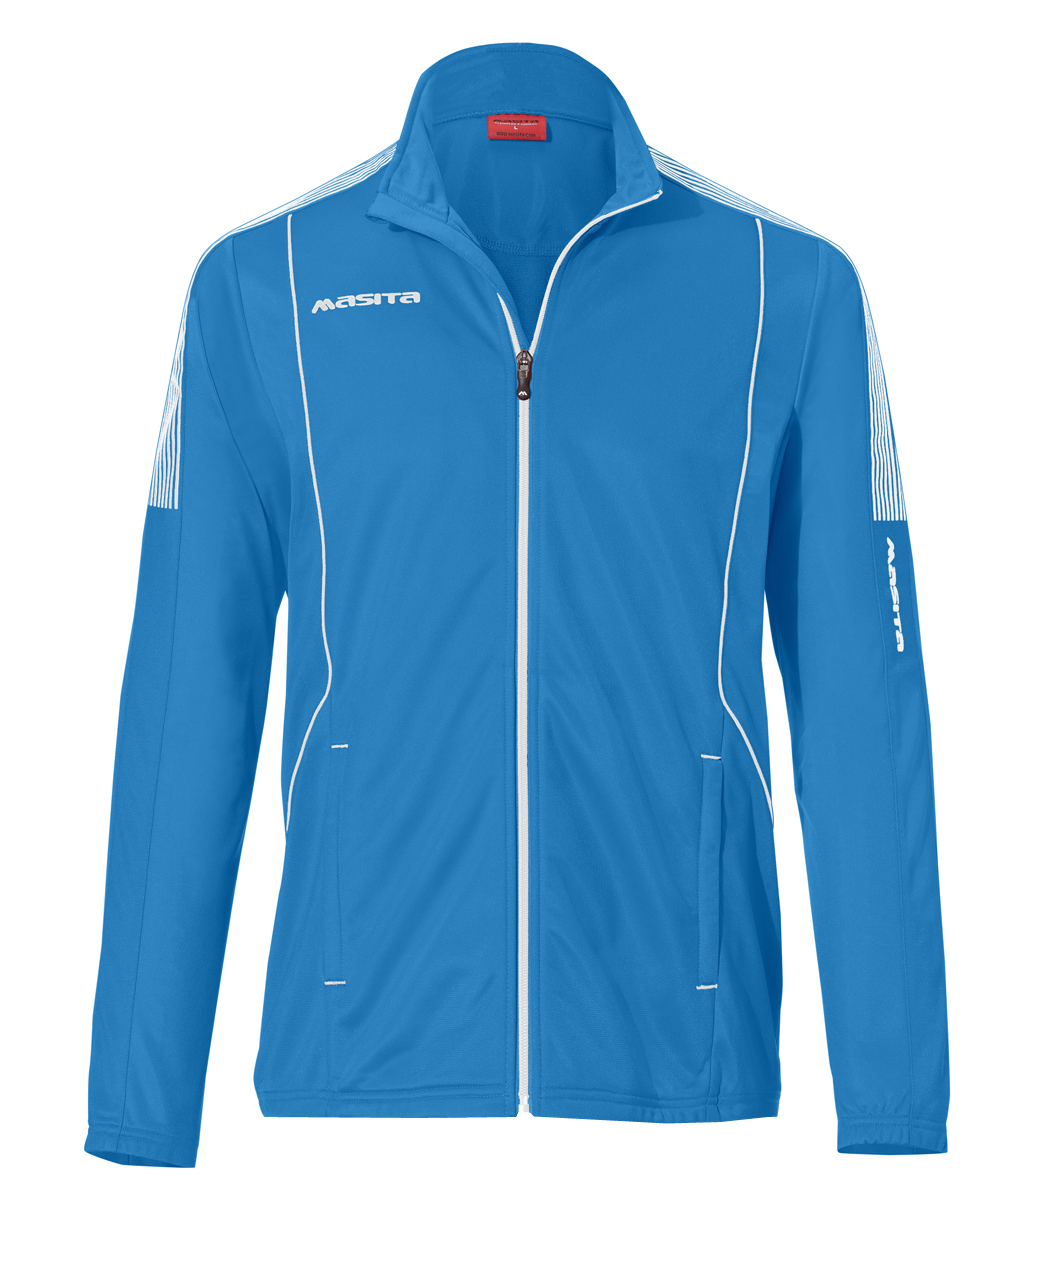 Polyester Jacket Barca  Sky Blue / White